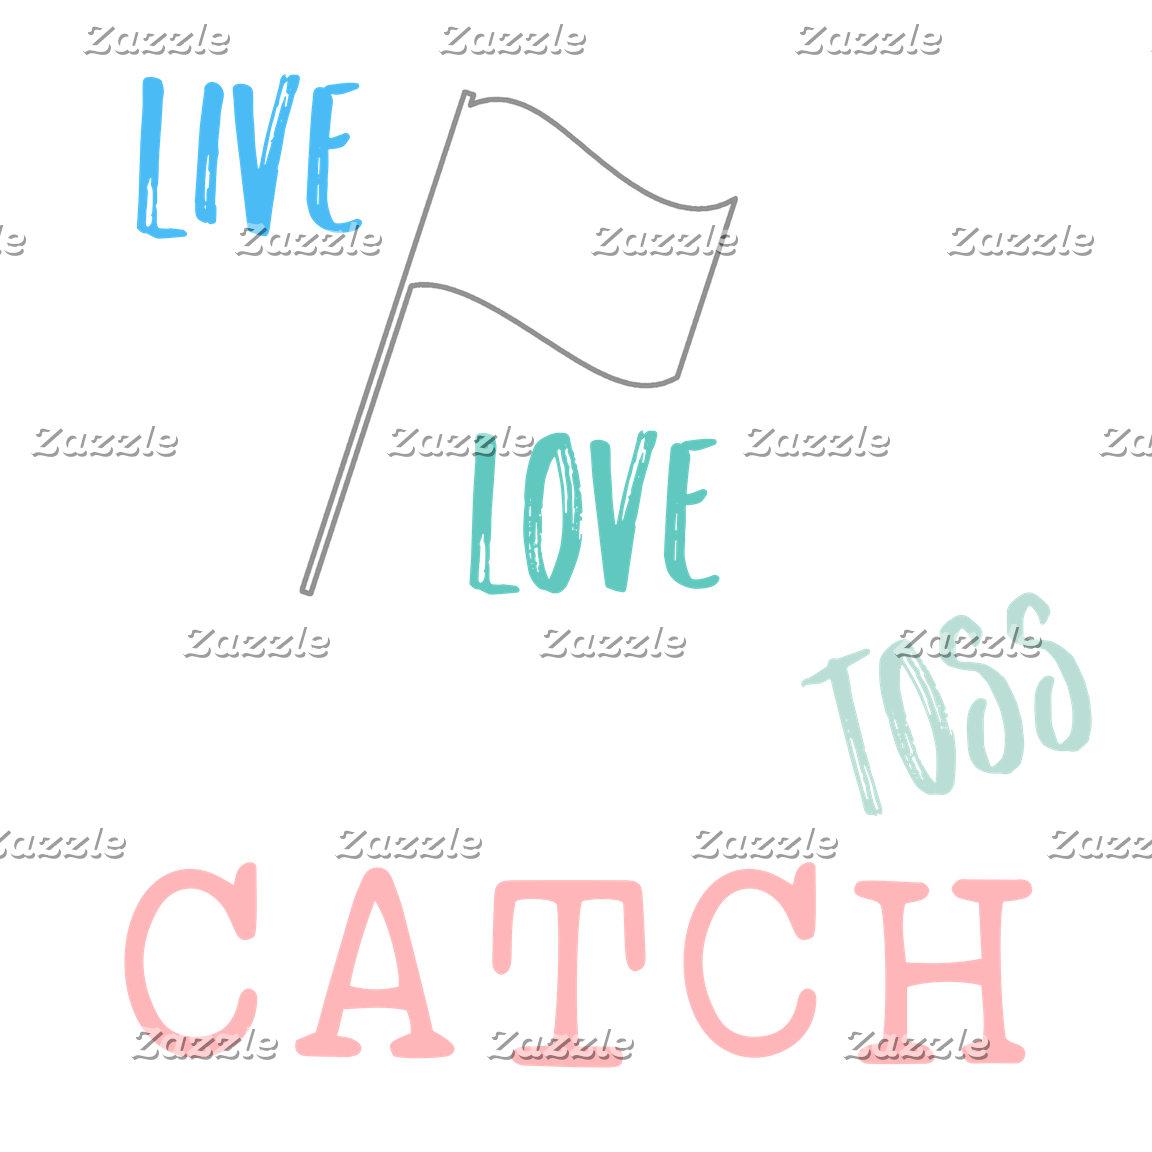 Live, Love, Toss, CATCH